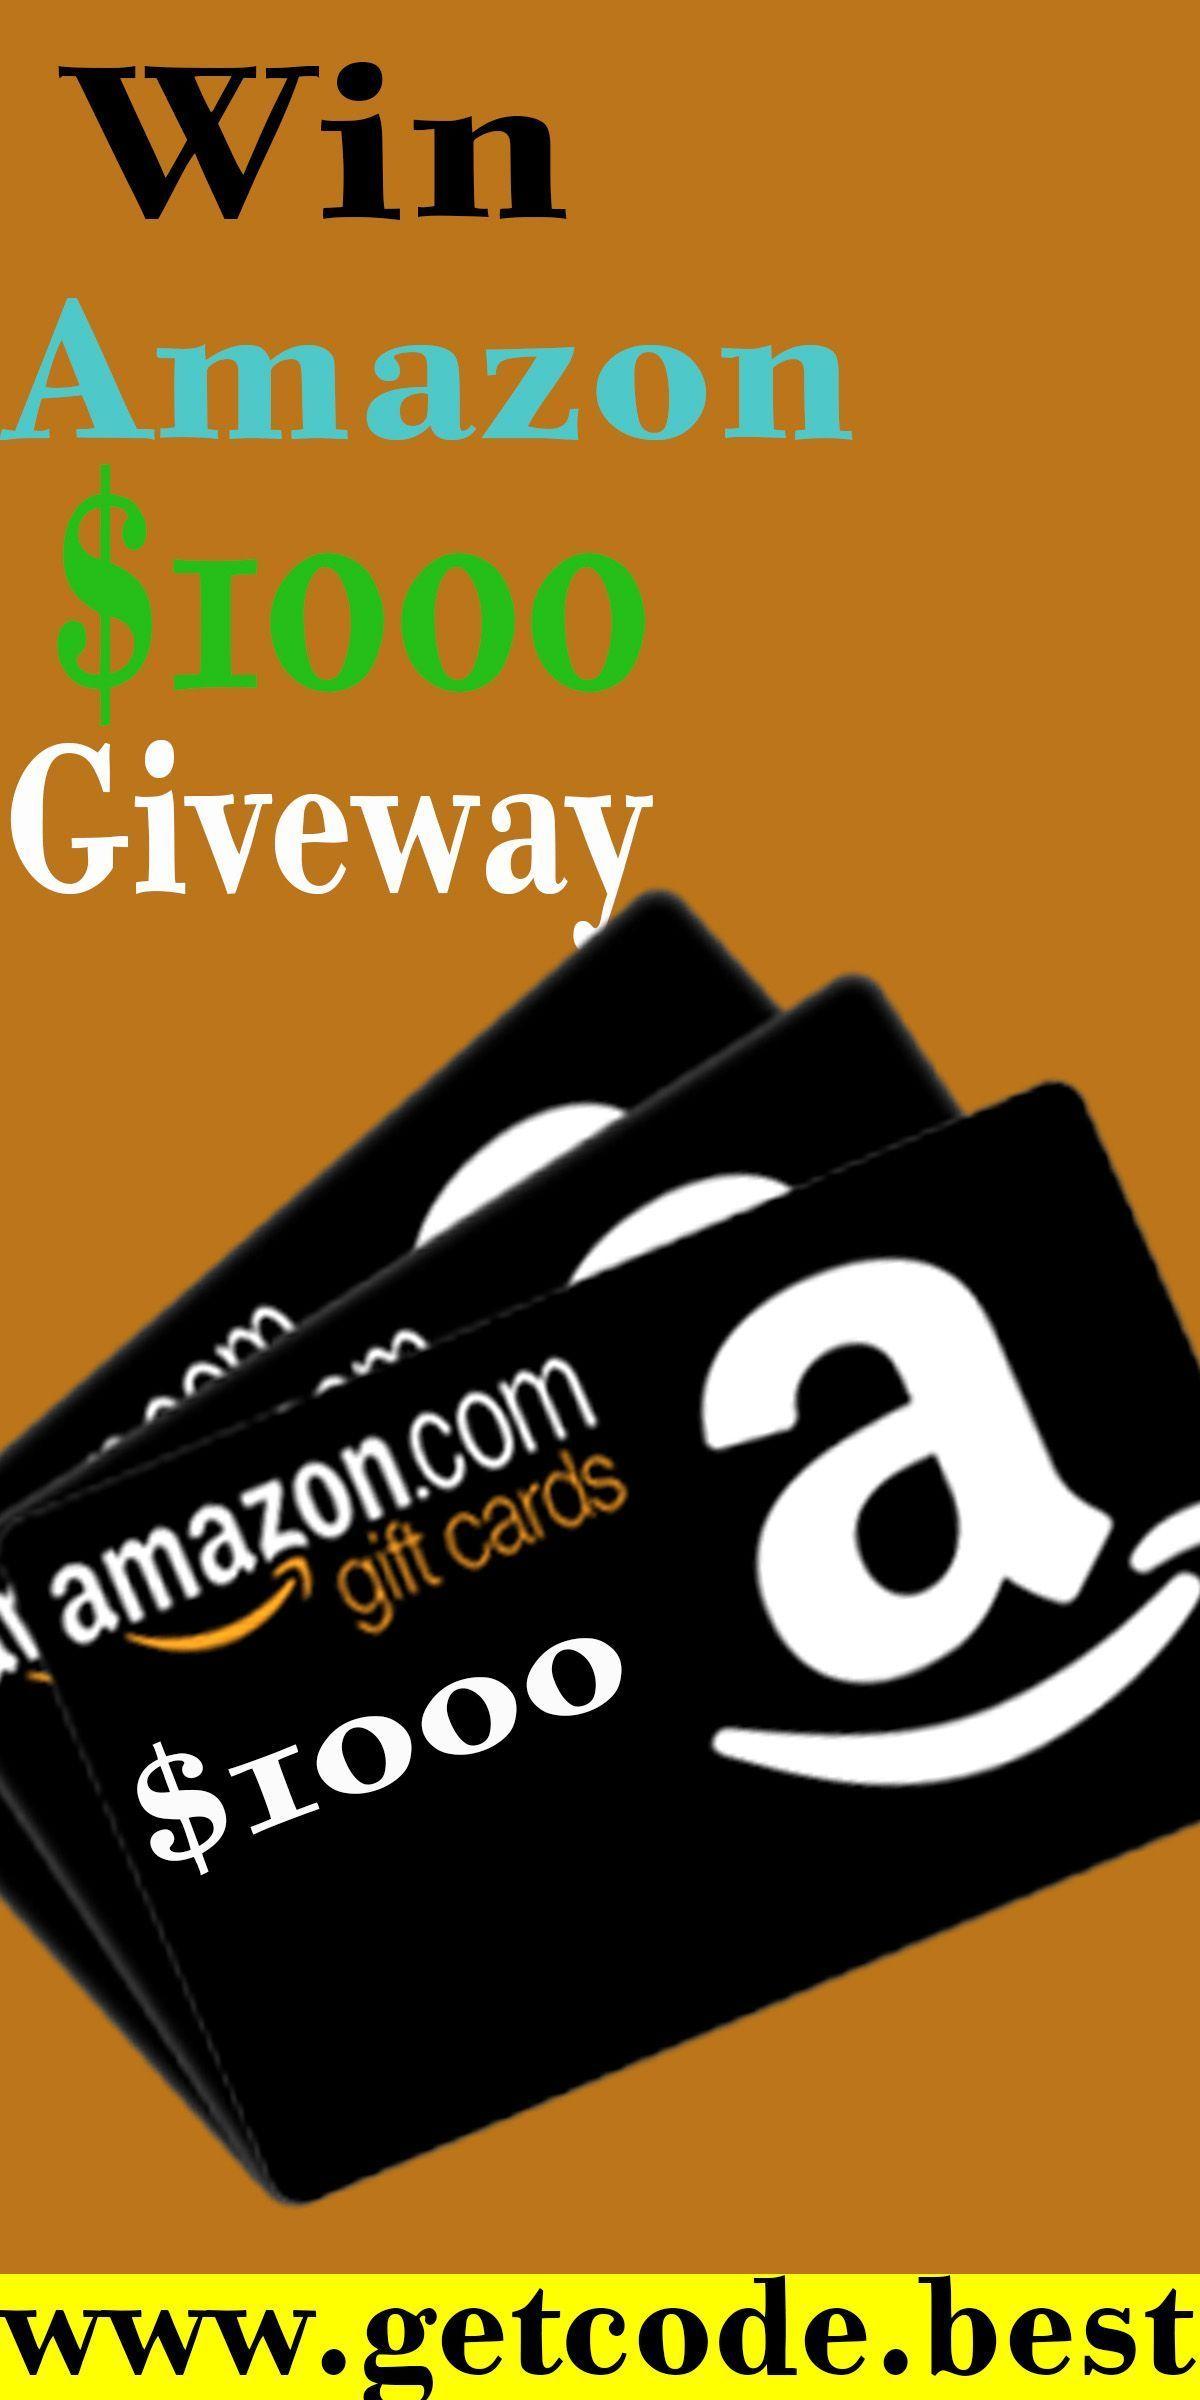 1000 Free Amazon Gift Cards 1000 Free Amazon Gift Cards Amazon Amazongiftcard Cards Co Amazon Gift Card Free Amazon Gift Cards Gift Card Specials